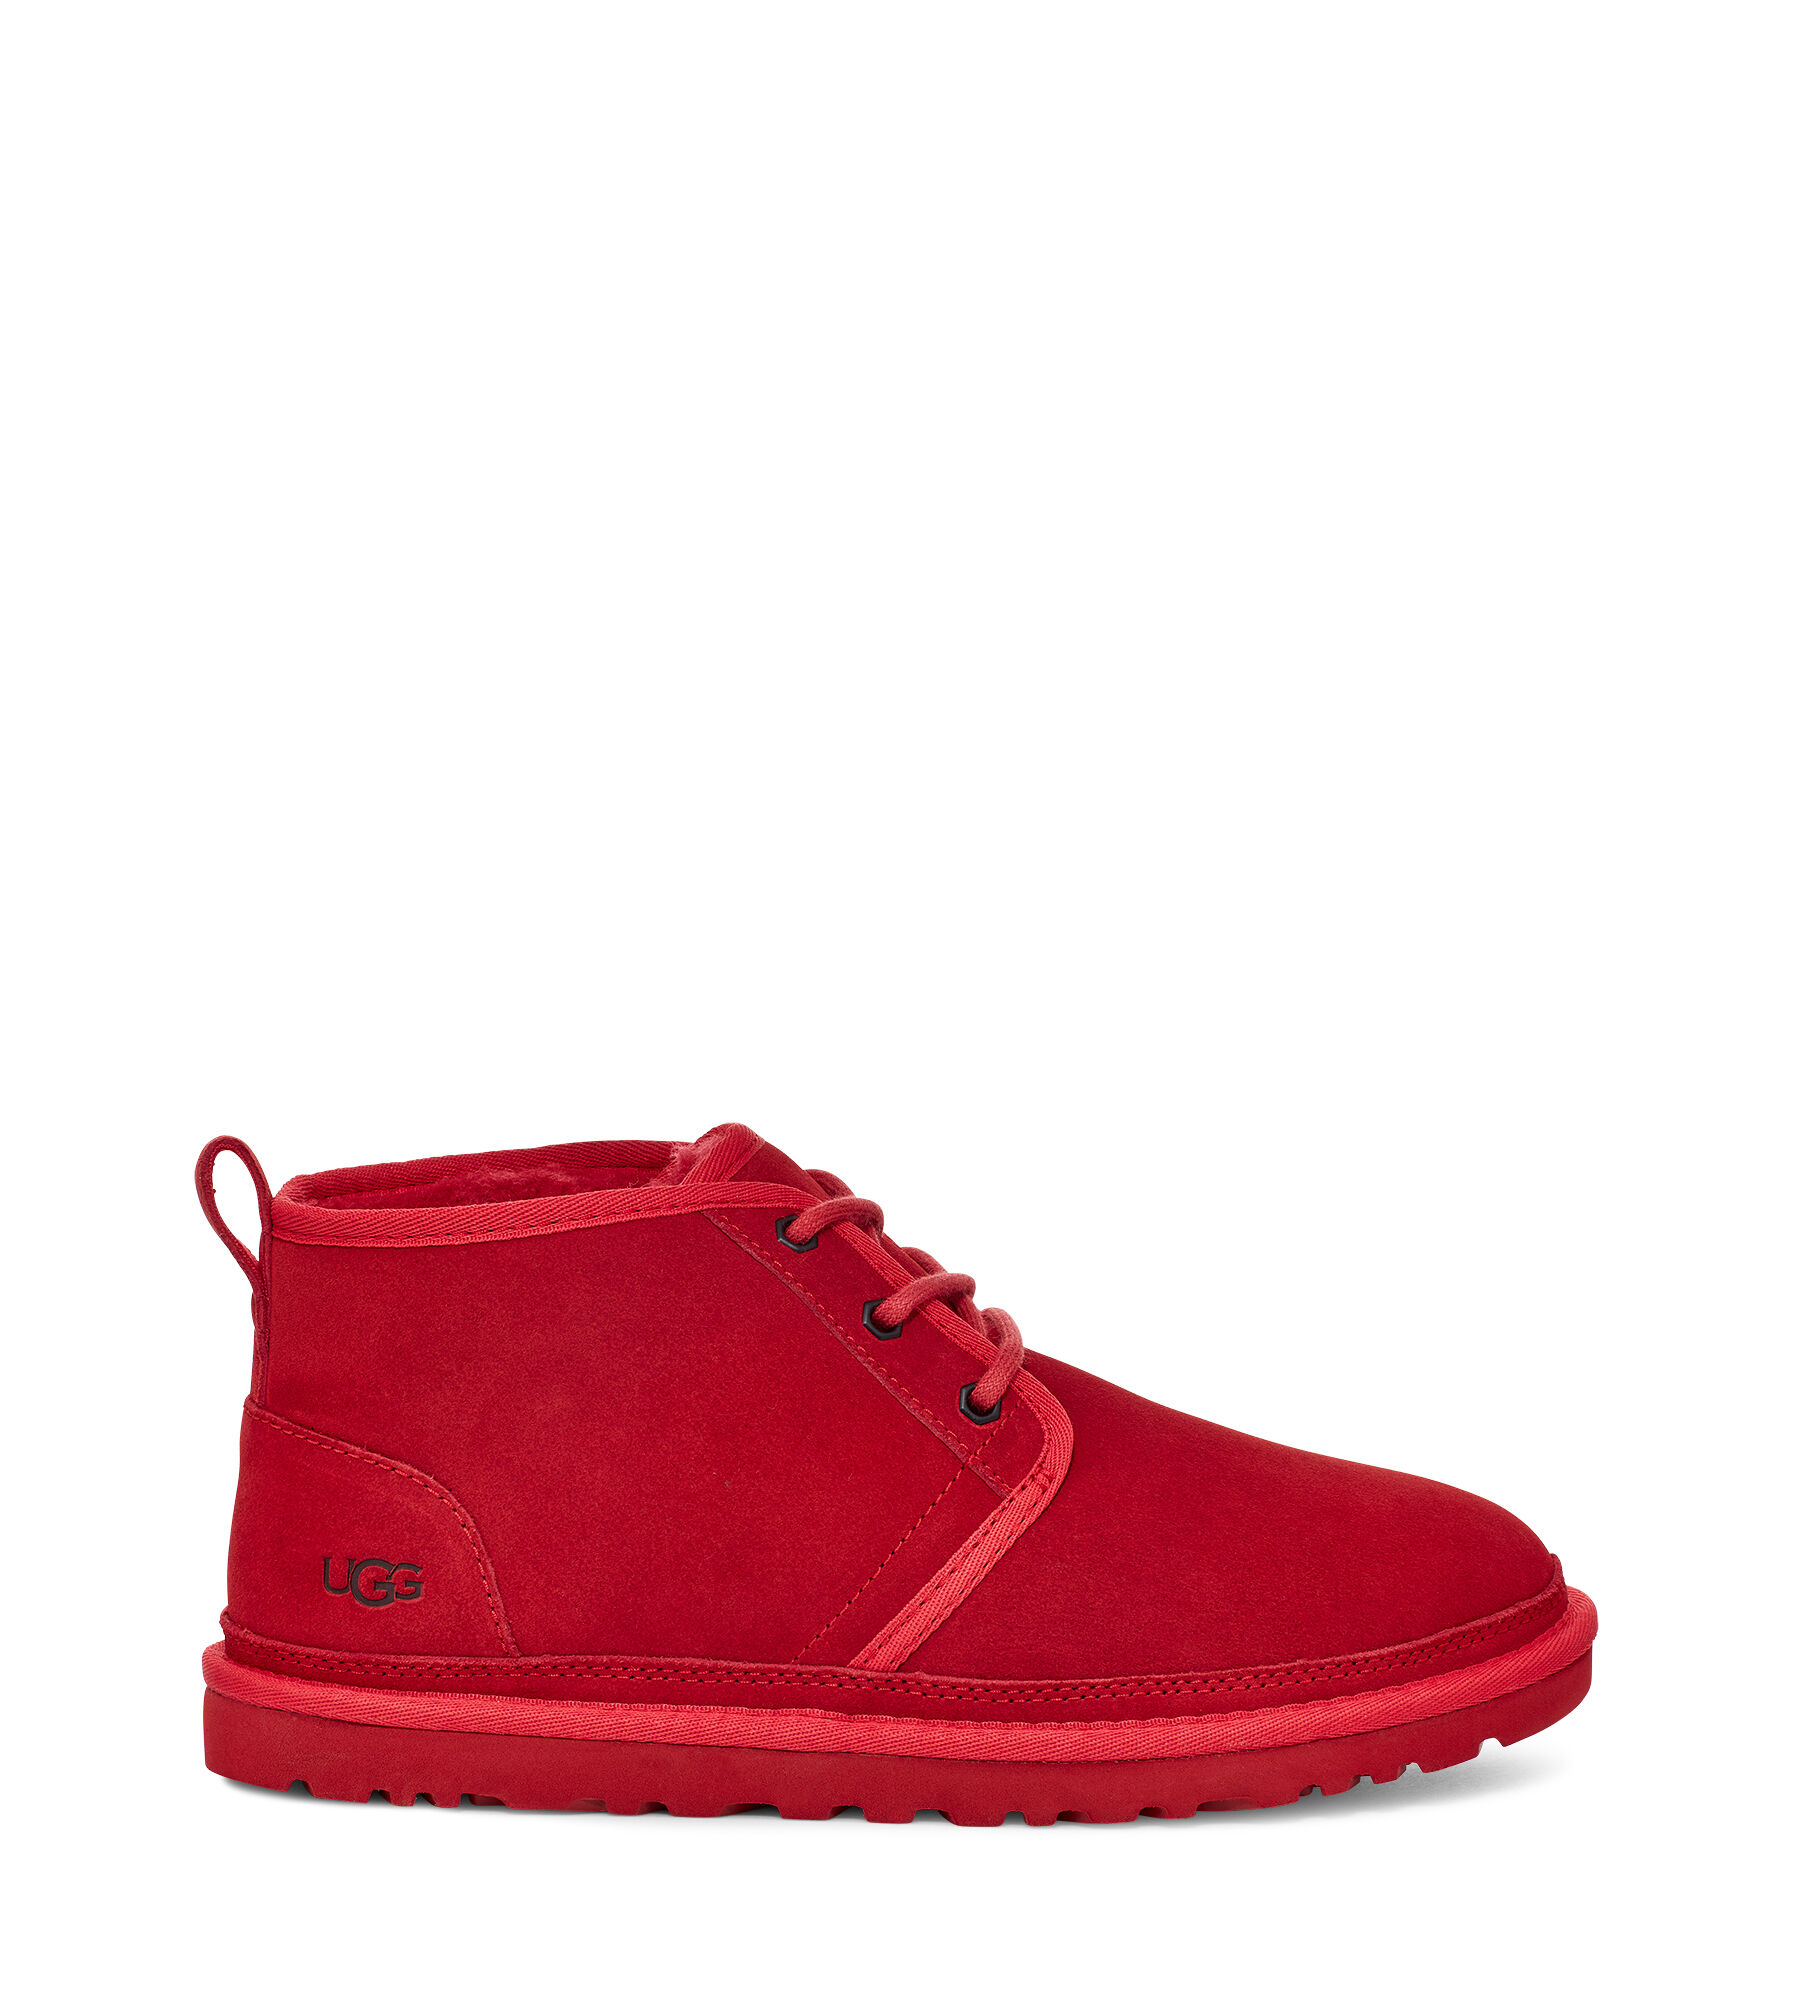 Men's Classic Sheepskin Boots | UGG